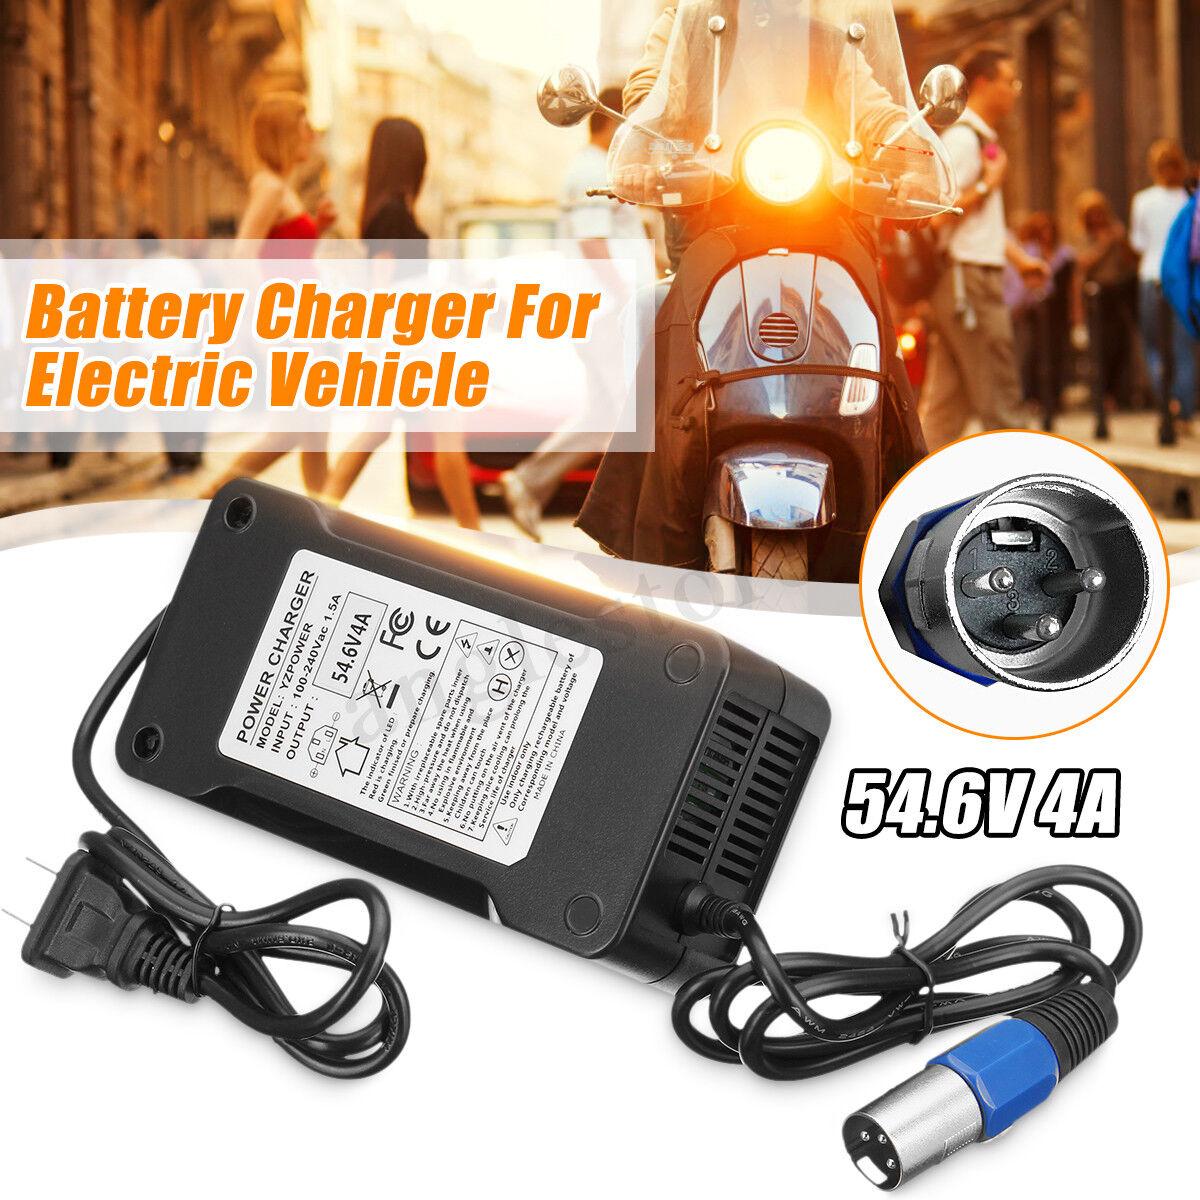 54.6V 4A Output 48V Lithium Battery Charger Black For Electr